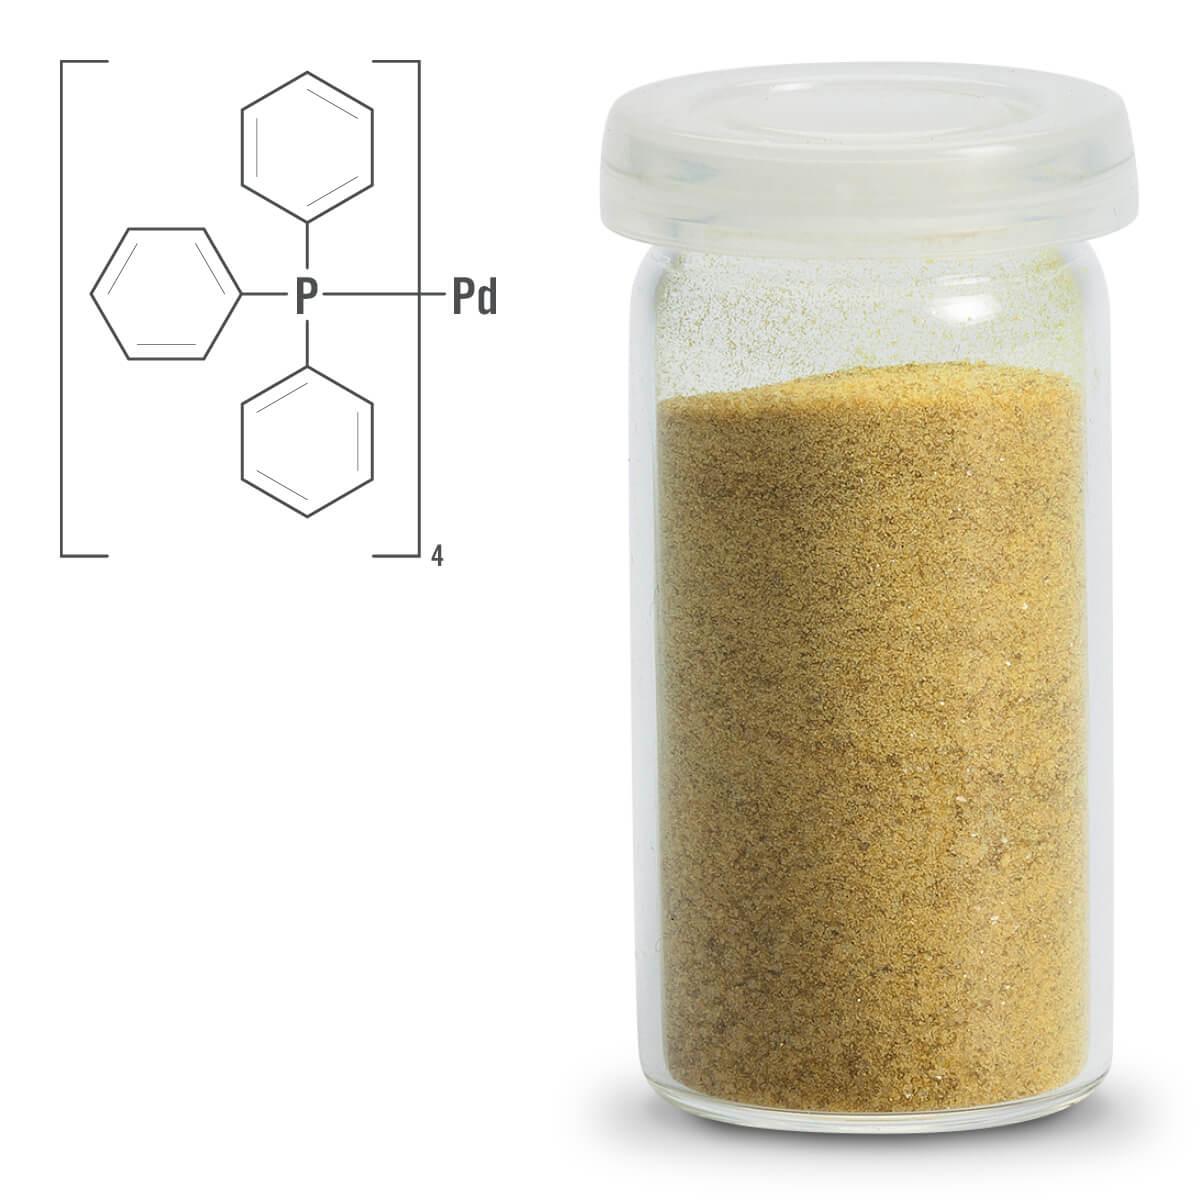 Tetrakis(triphenylphosphane)palladium(0)